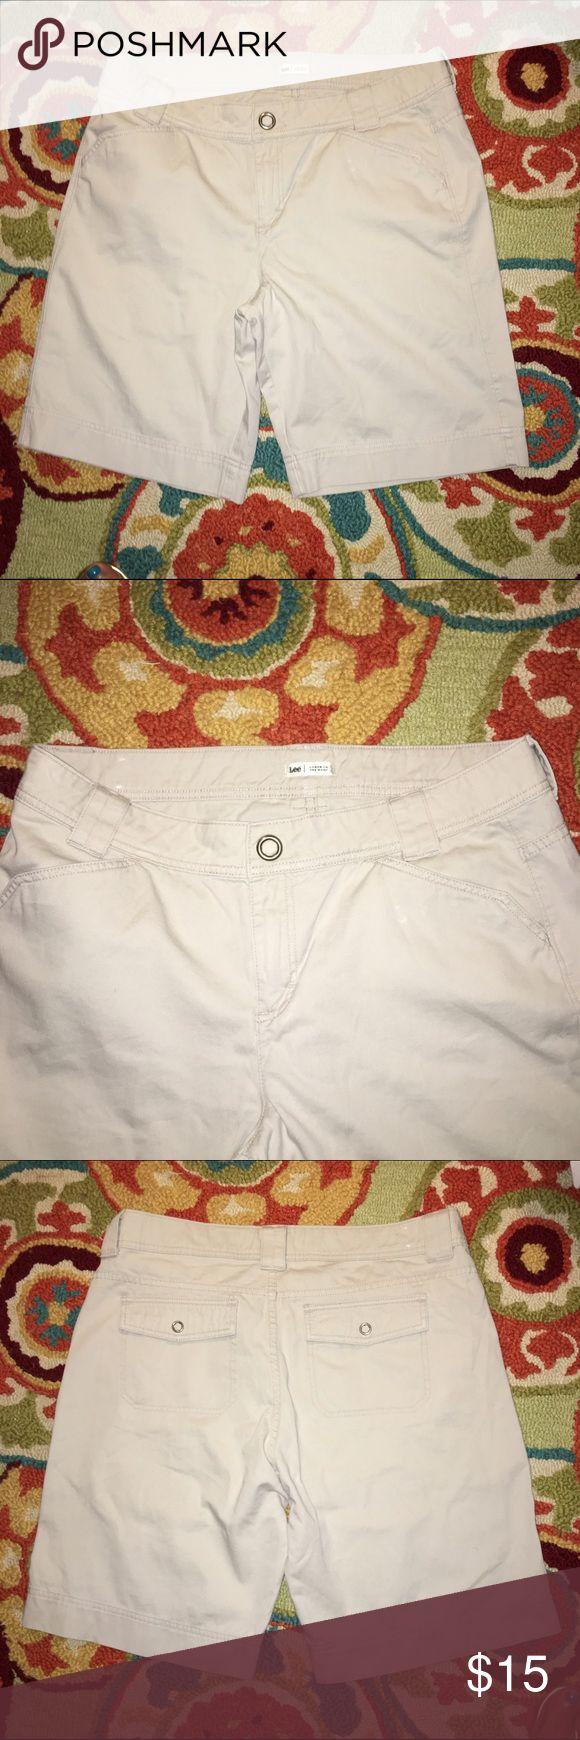 LEVIS BERMUDA SHORTS LEVIS TAN BERMUDA SHORTS WITH OPEN SIDE POCKETS N BUTTON REAR POCKETS EXCELLENT CONDITION SIZE 16 M Levi's Shorts Bermudas